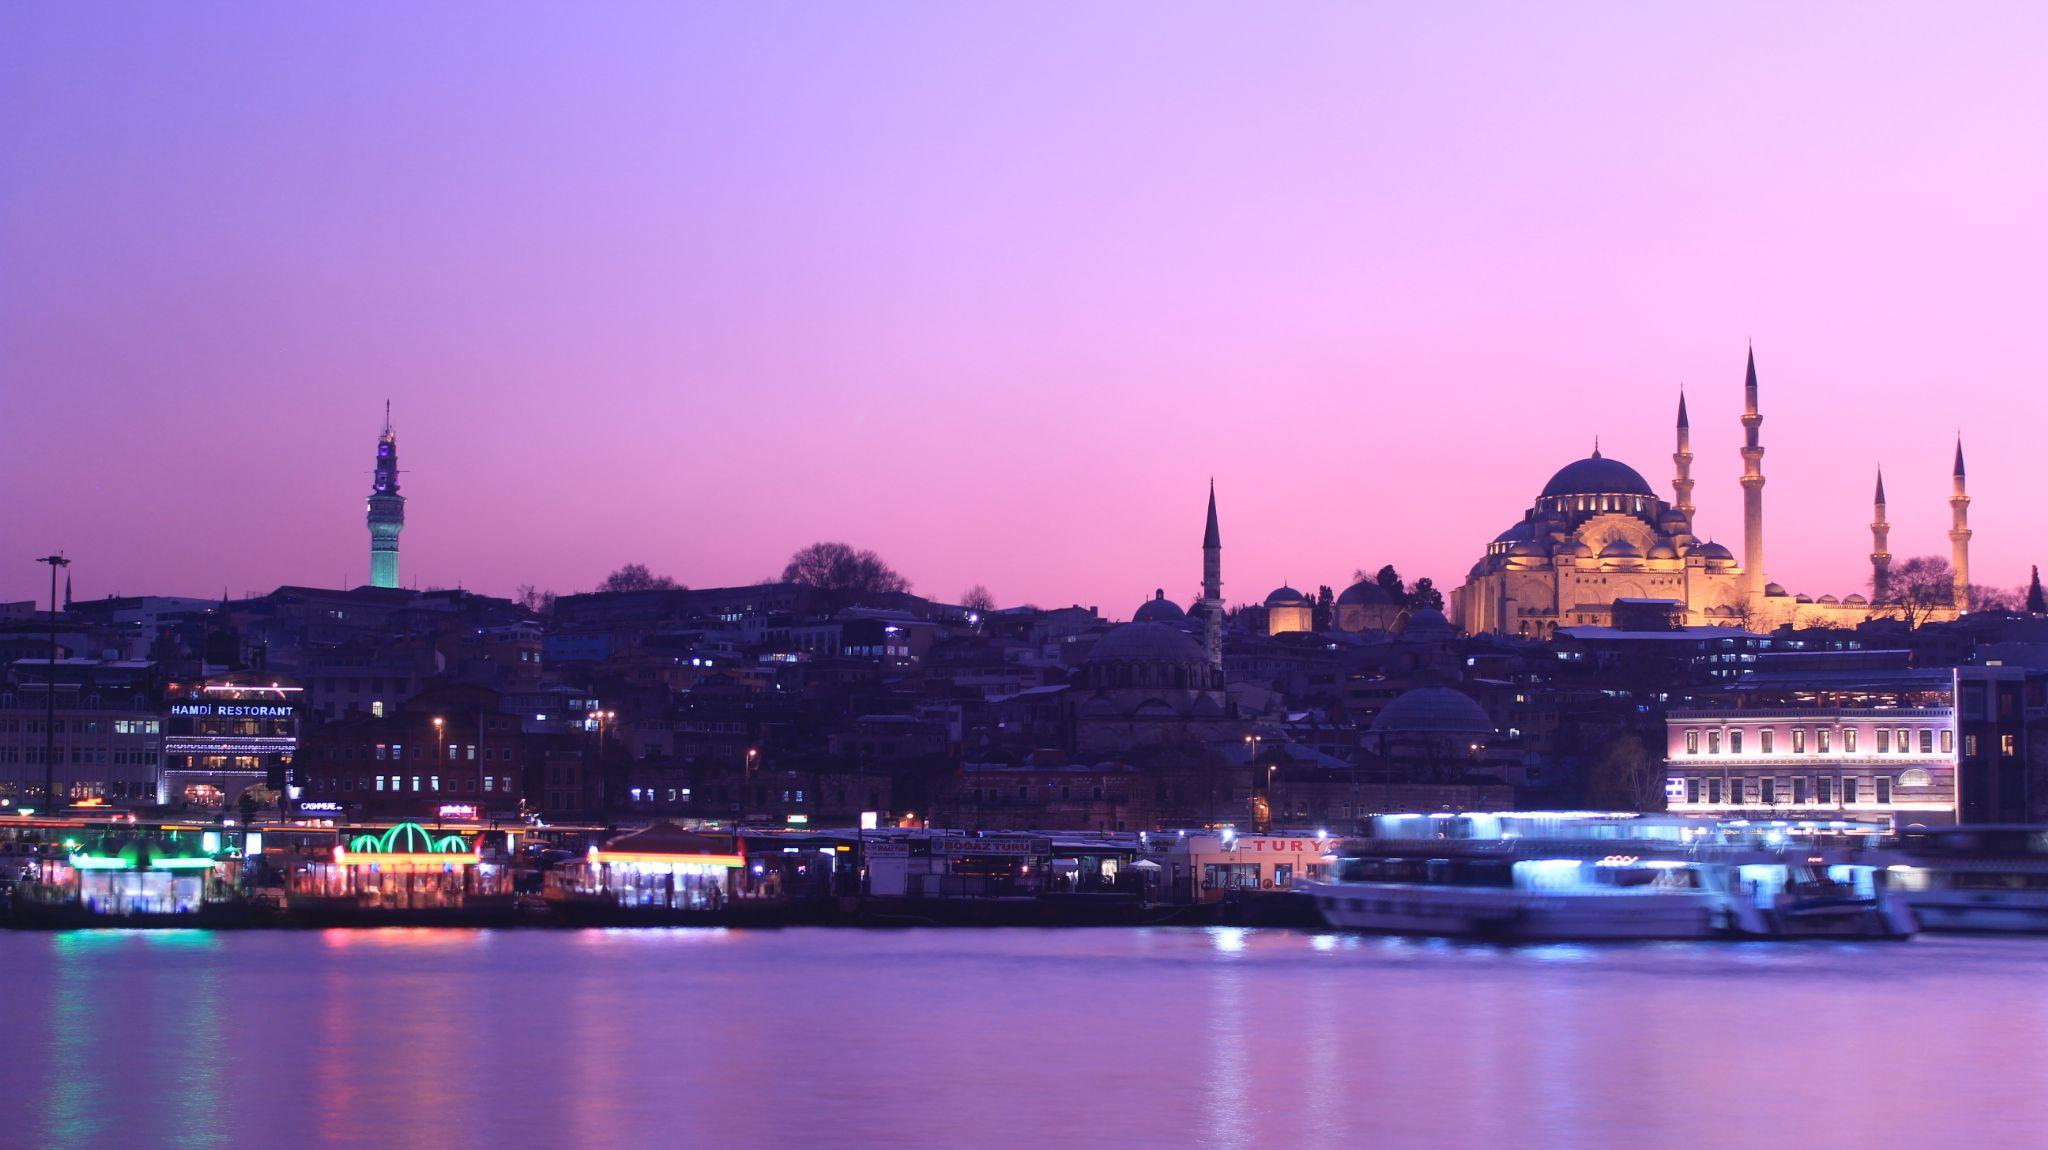 Haliç Süleymaniye Mosque by Ali Kemal Özer